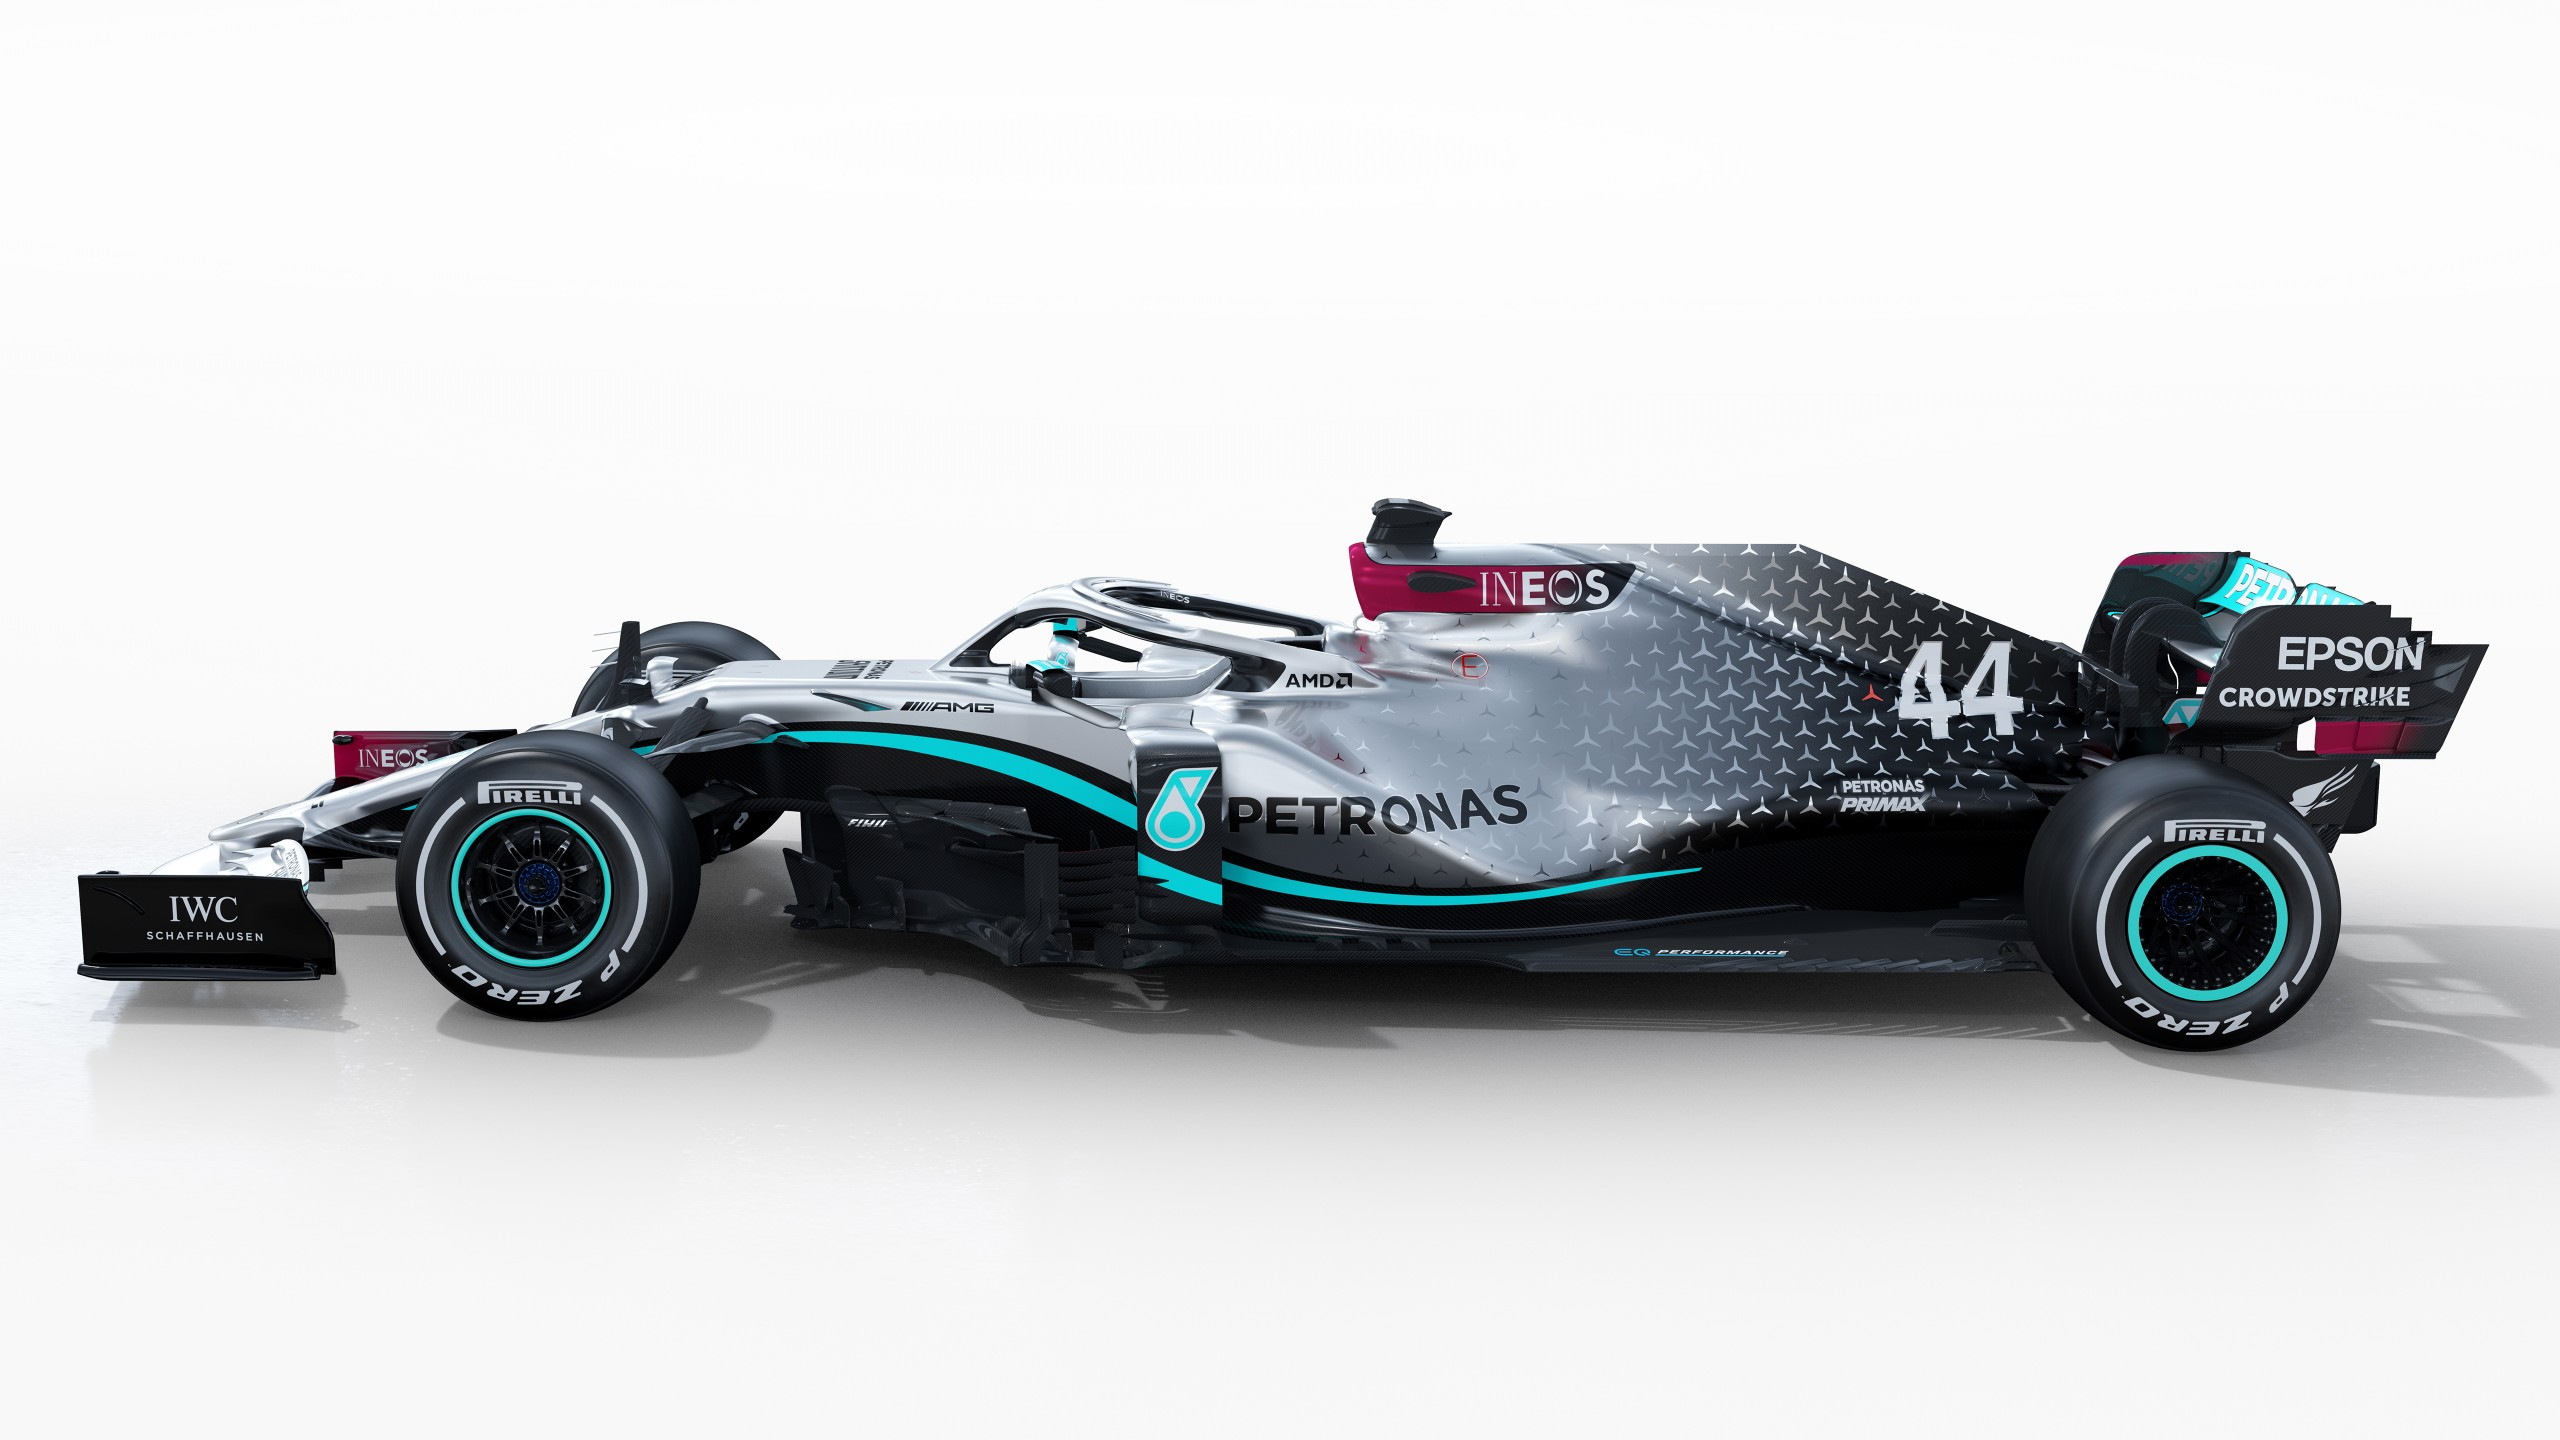 Mercedes AMG F1 W11 EQ Performance 2020 5K Wallpaper HD Car 2560x1440